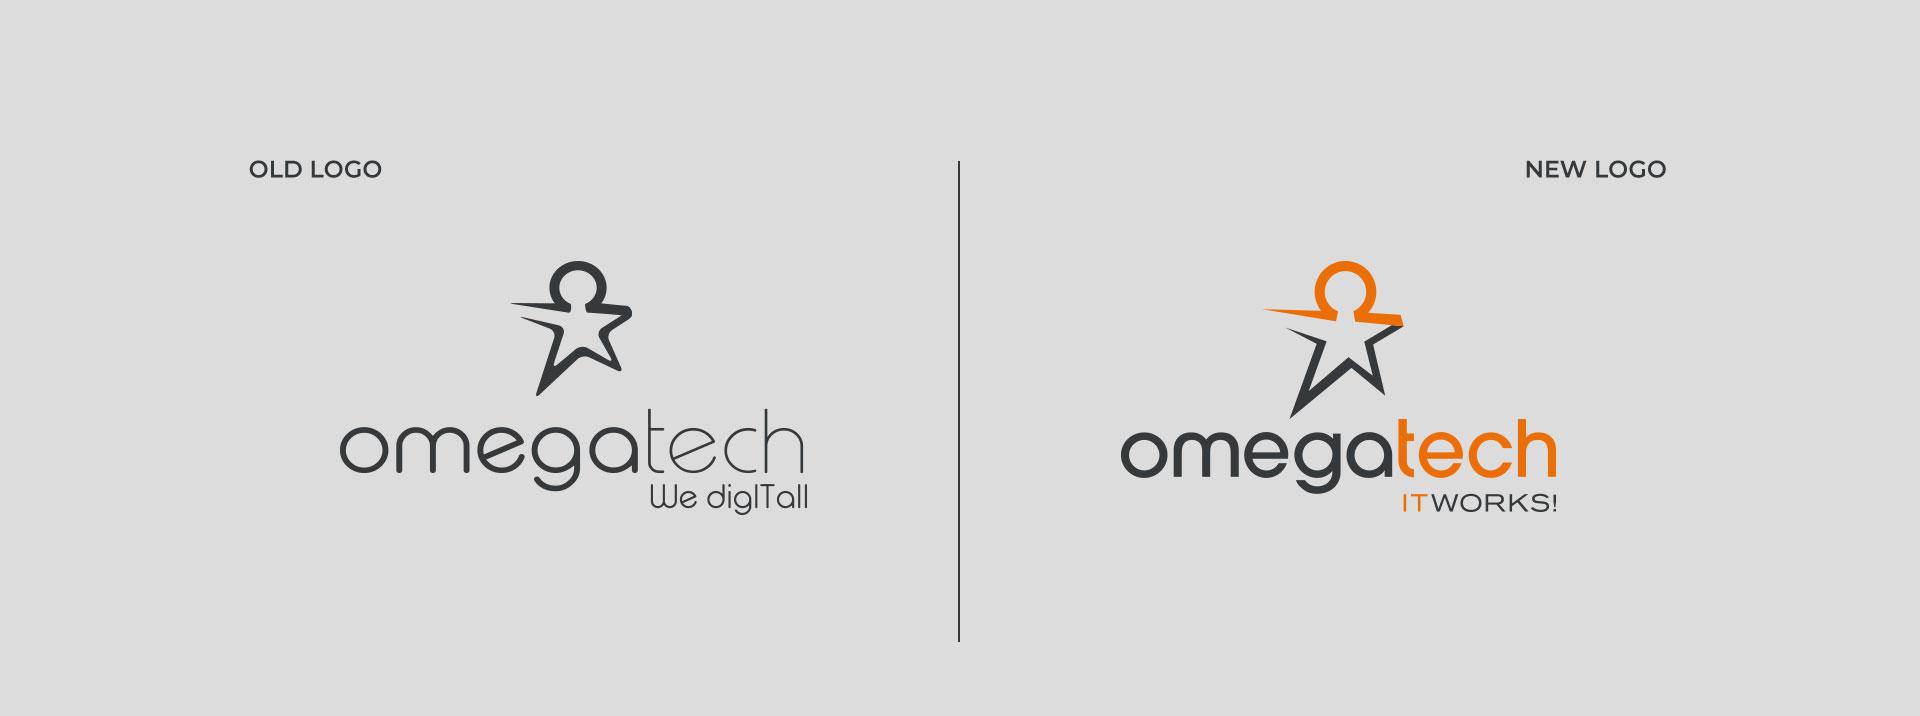 omegatech-zerouno-design-logo-restyle-rebranding